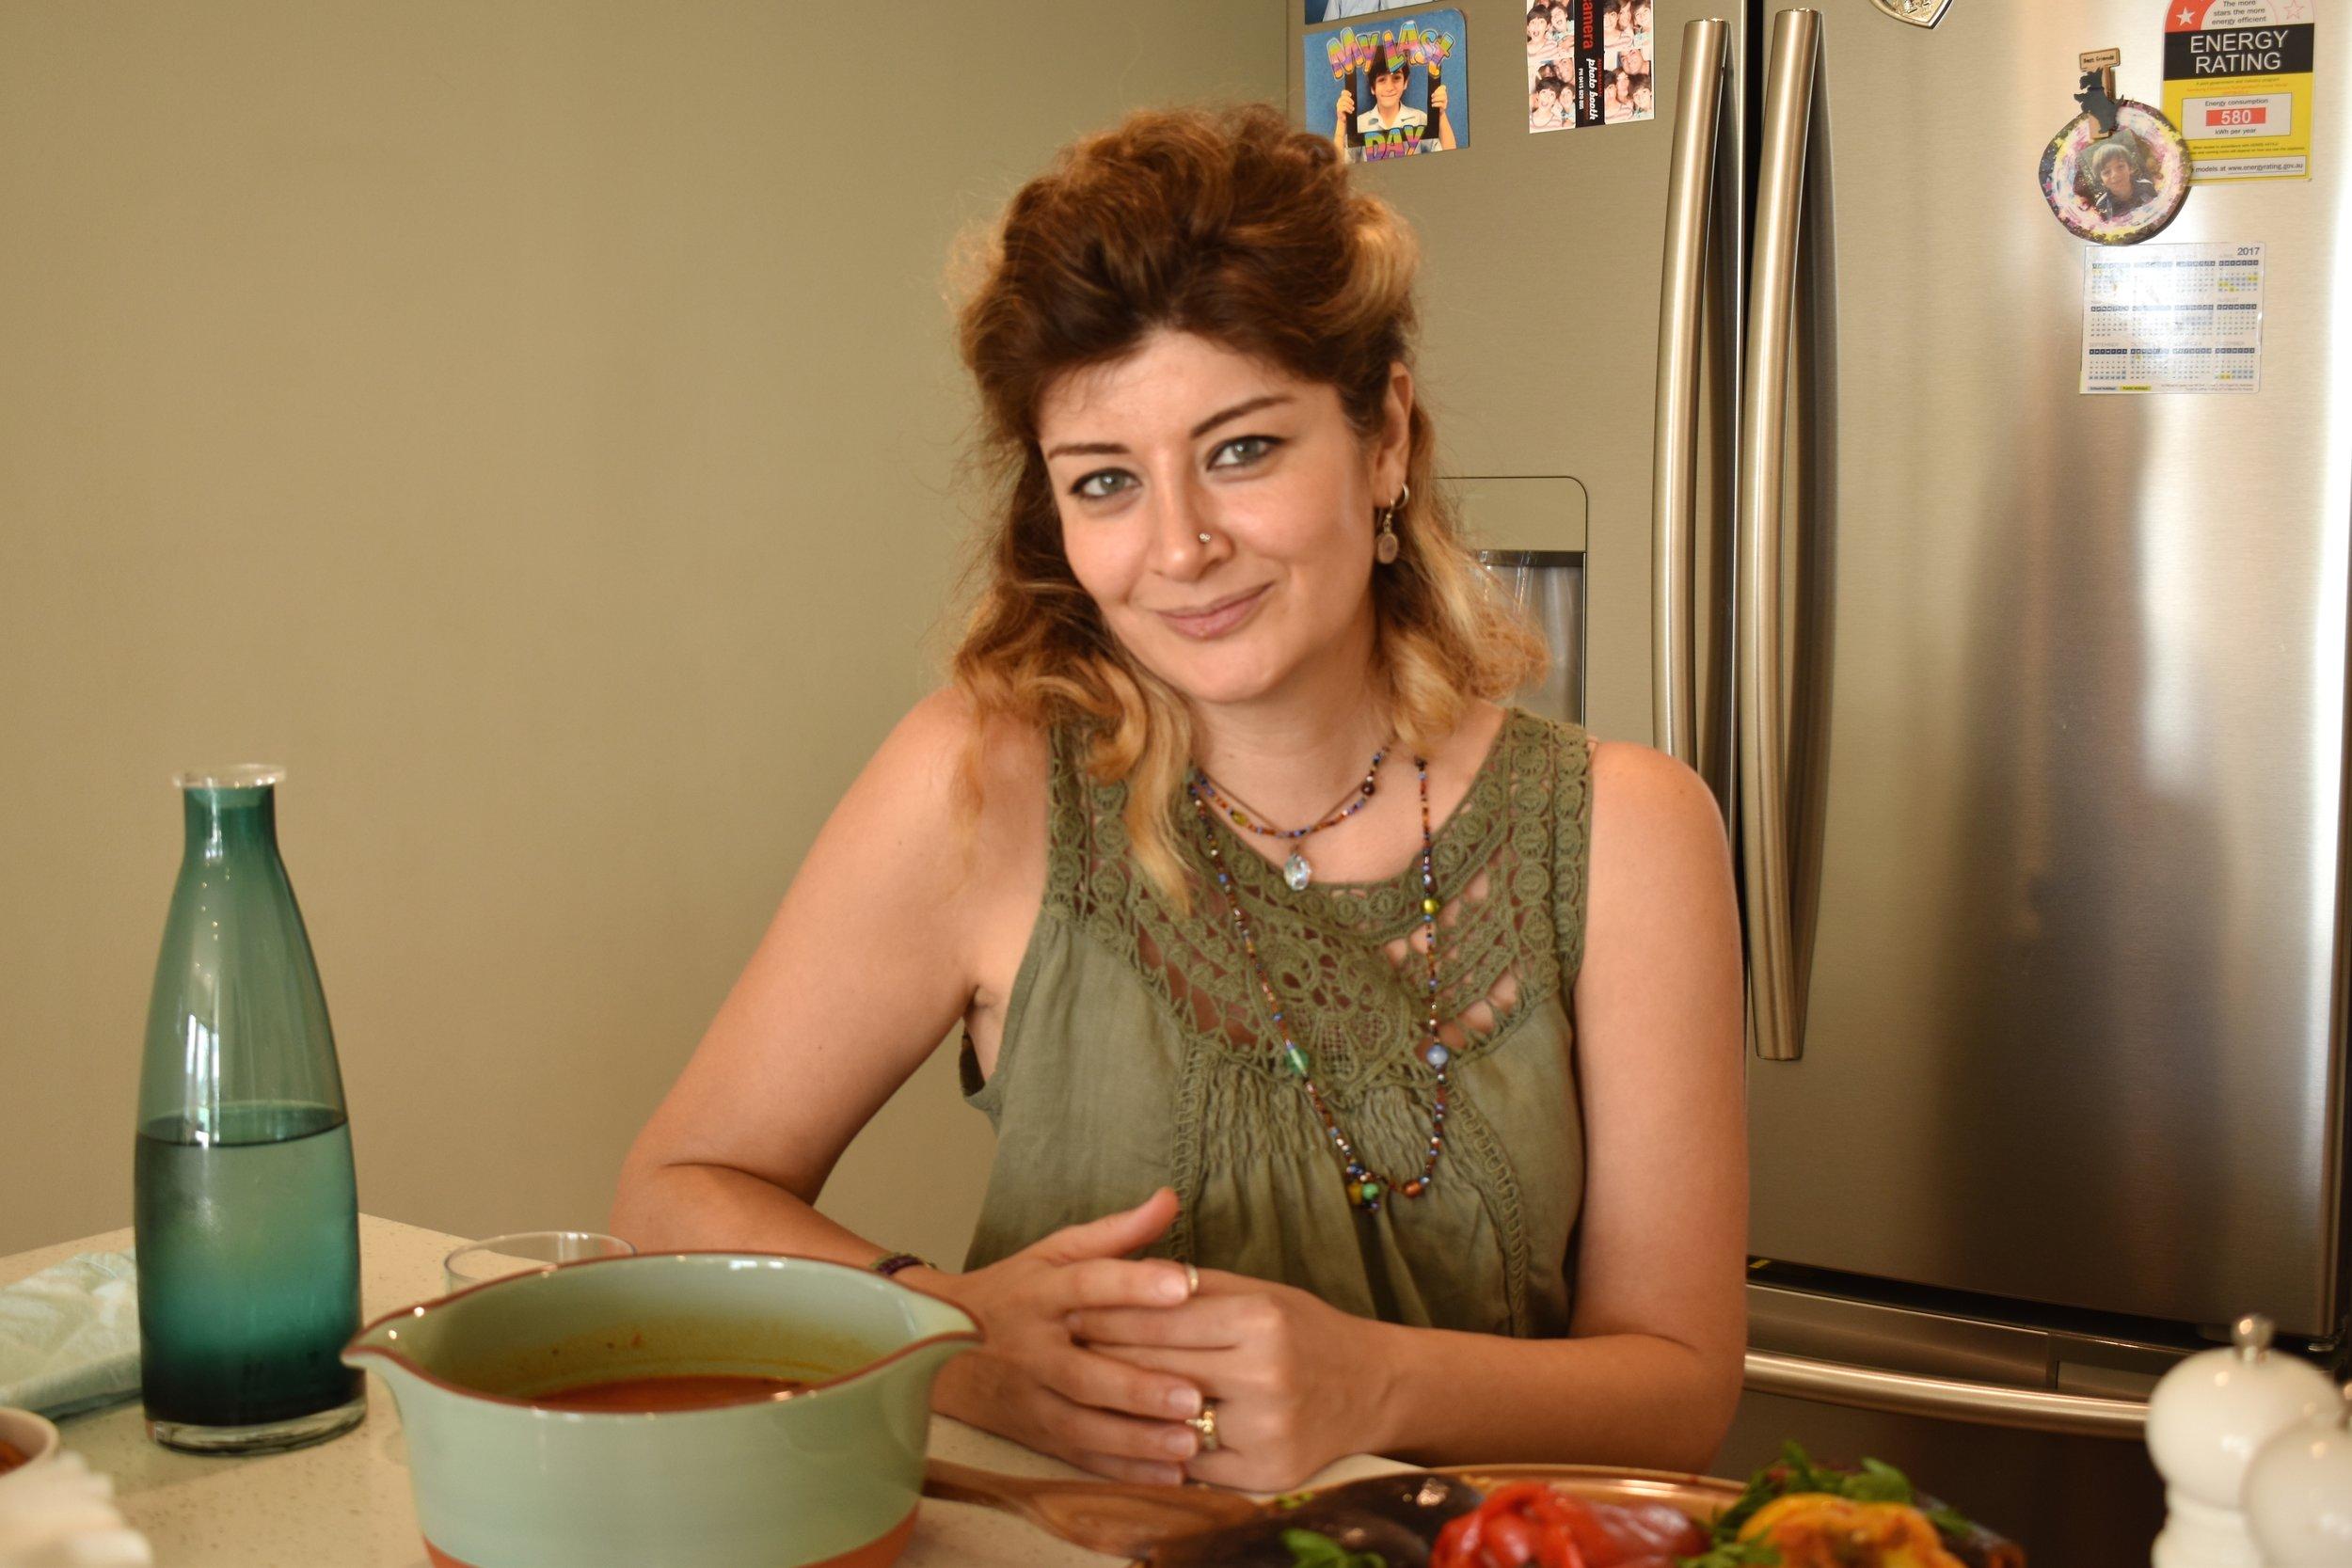 Nadia is seen here having a break in her kitchen